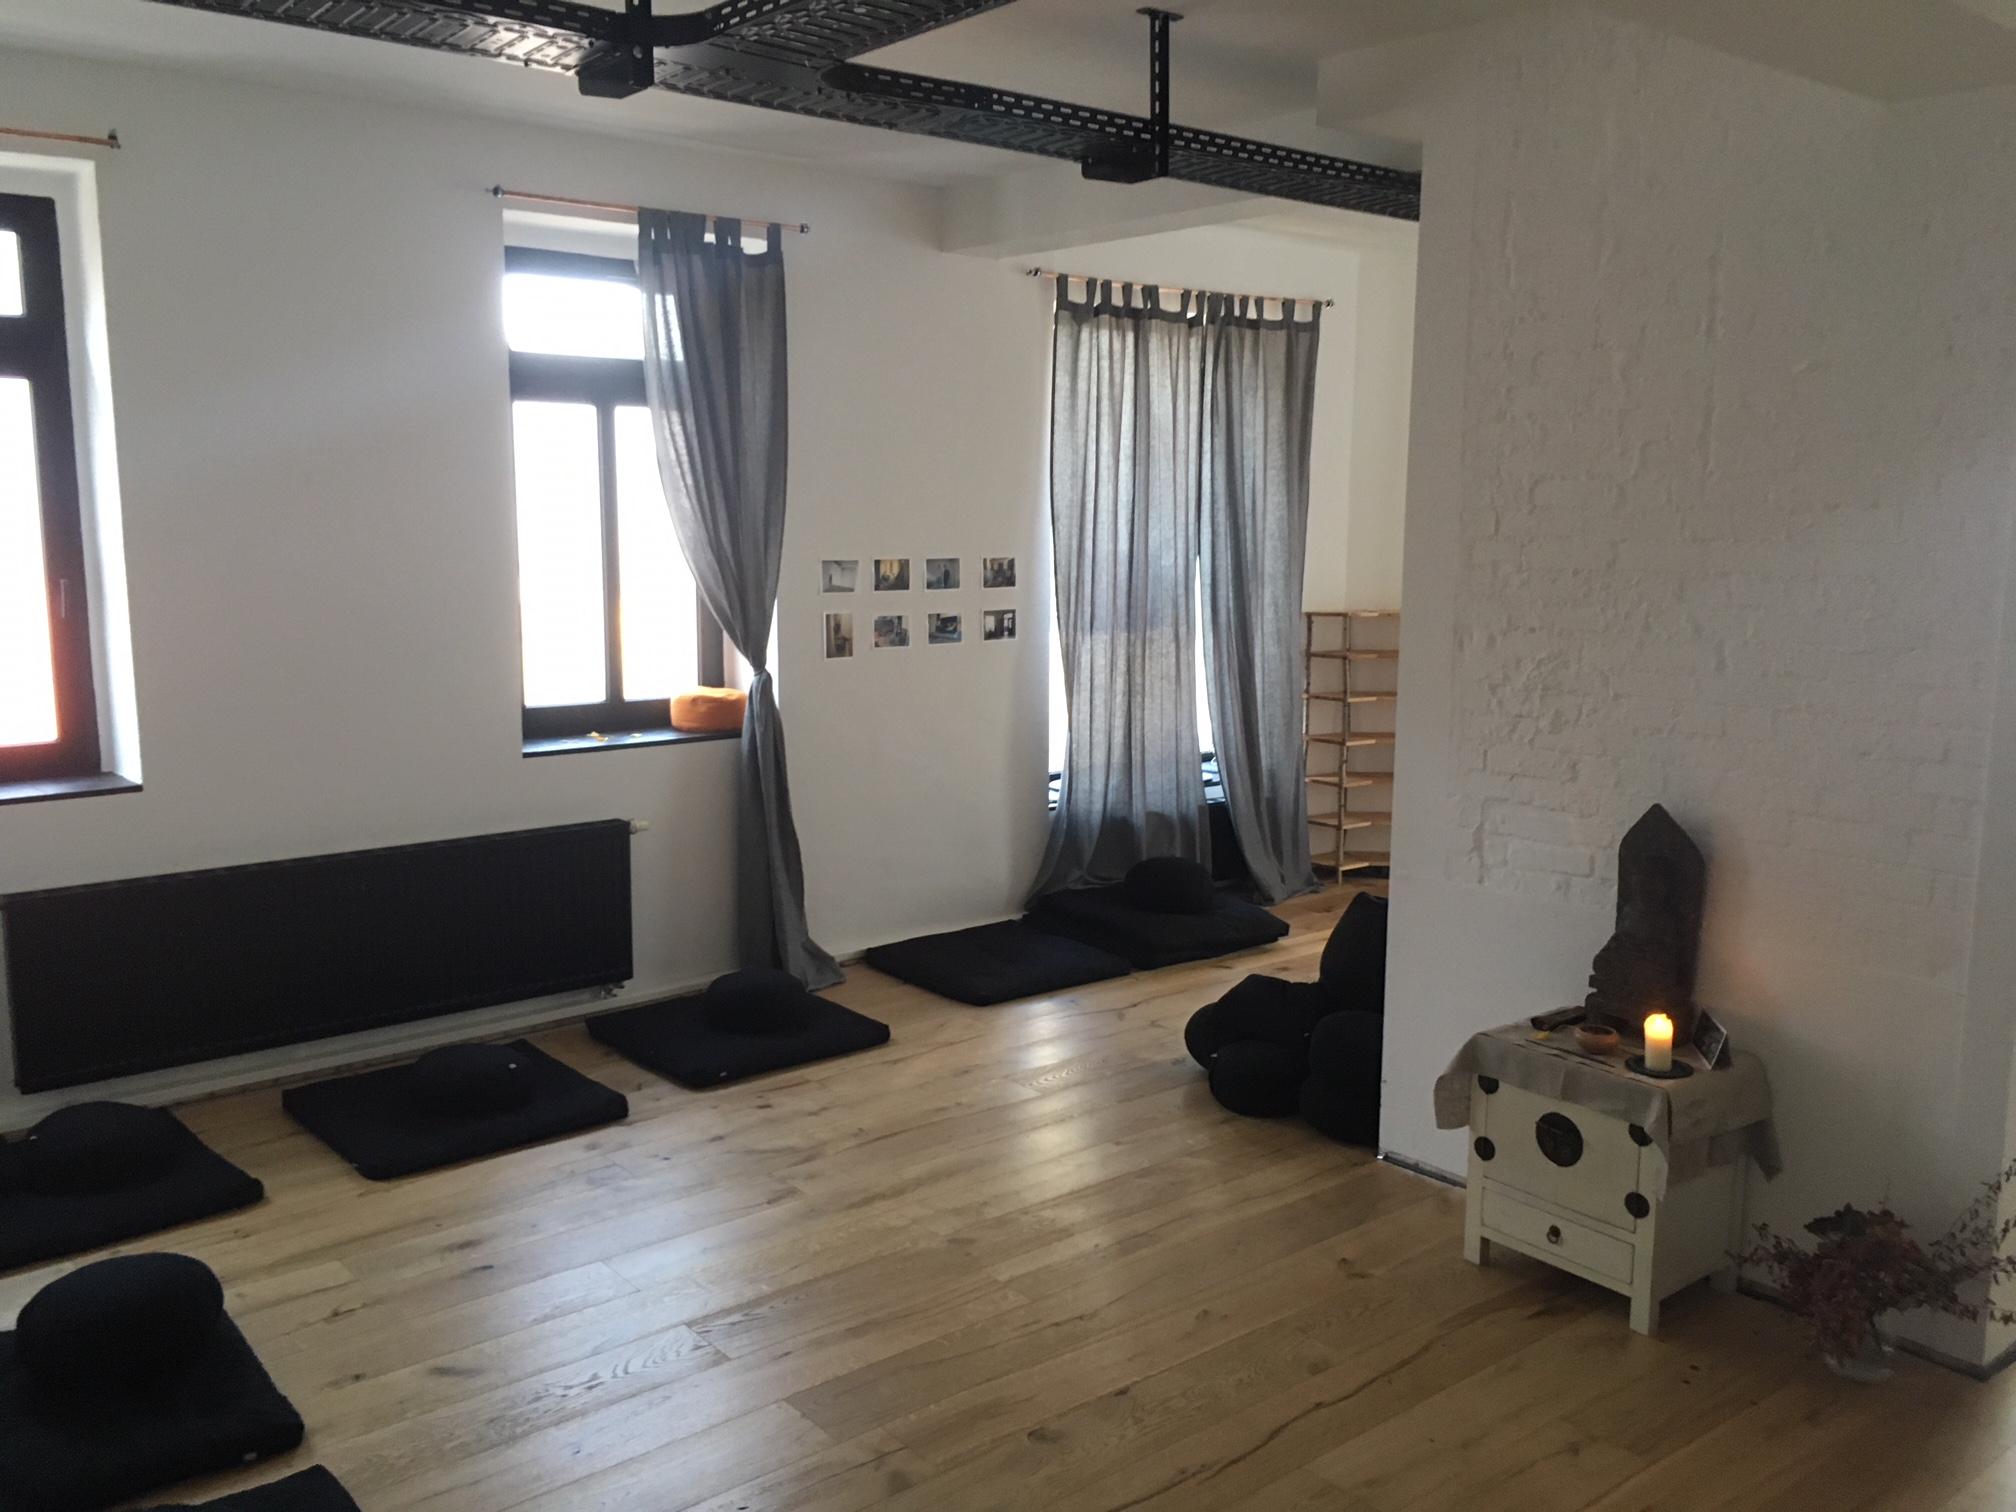 Zen lab zazen zen meditation buddhismus